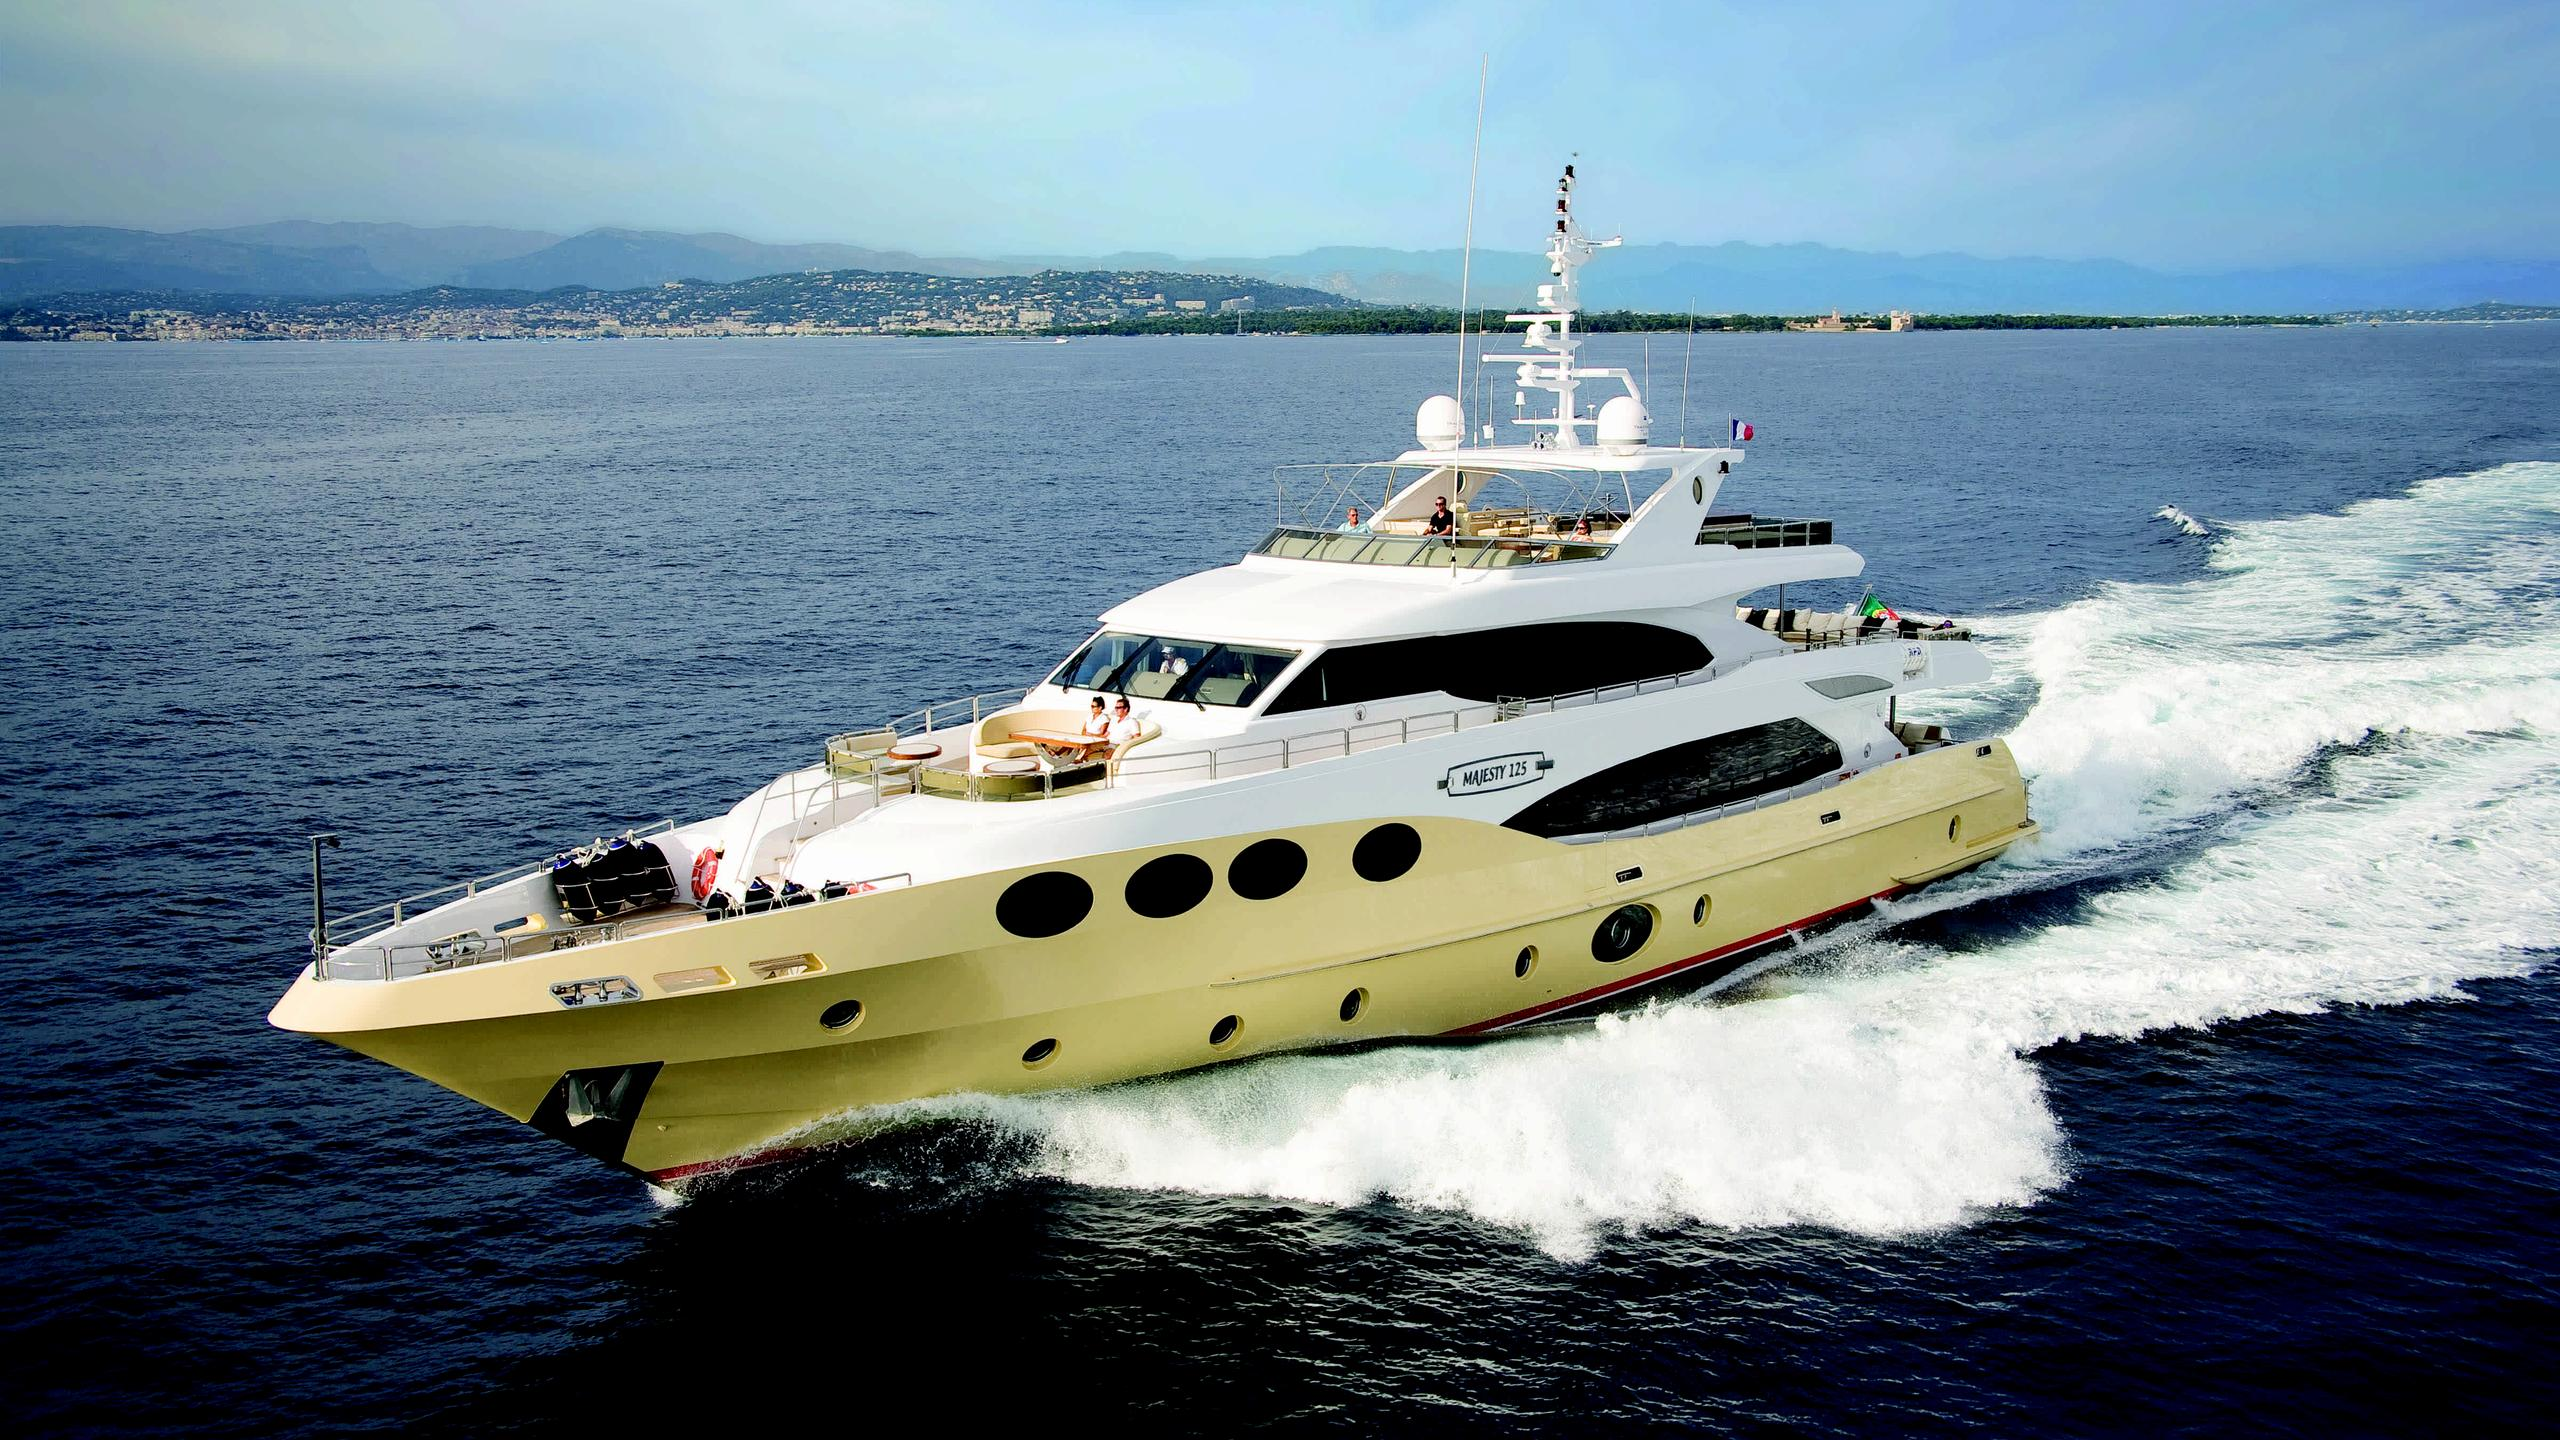 veneta grenadines iii motor yacht gulf craft majesty 125 38m 2010 half profile